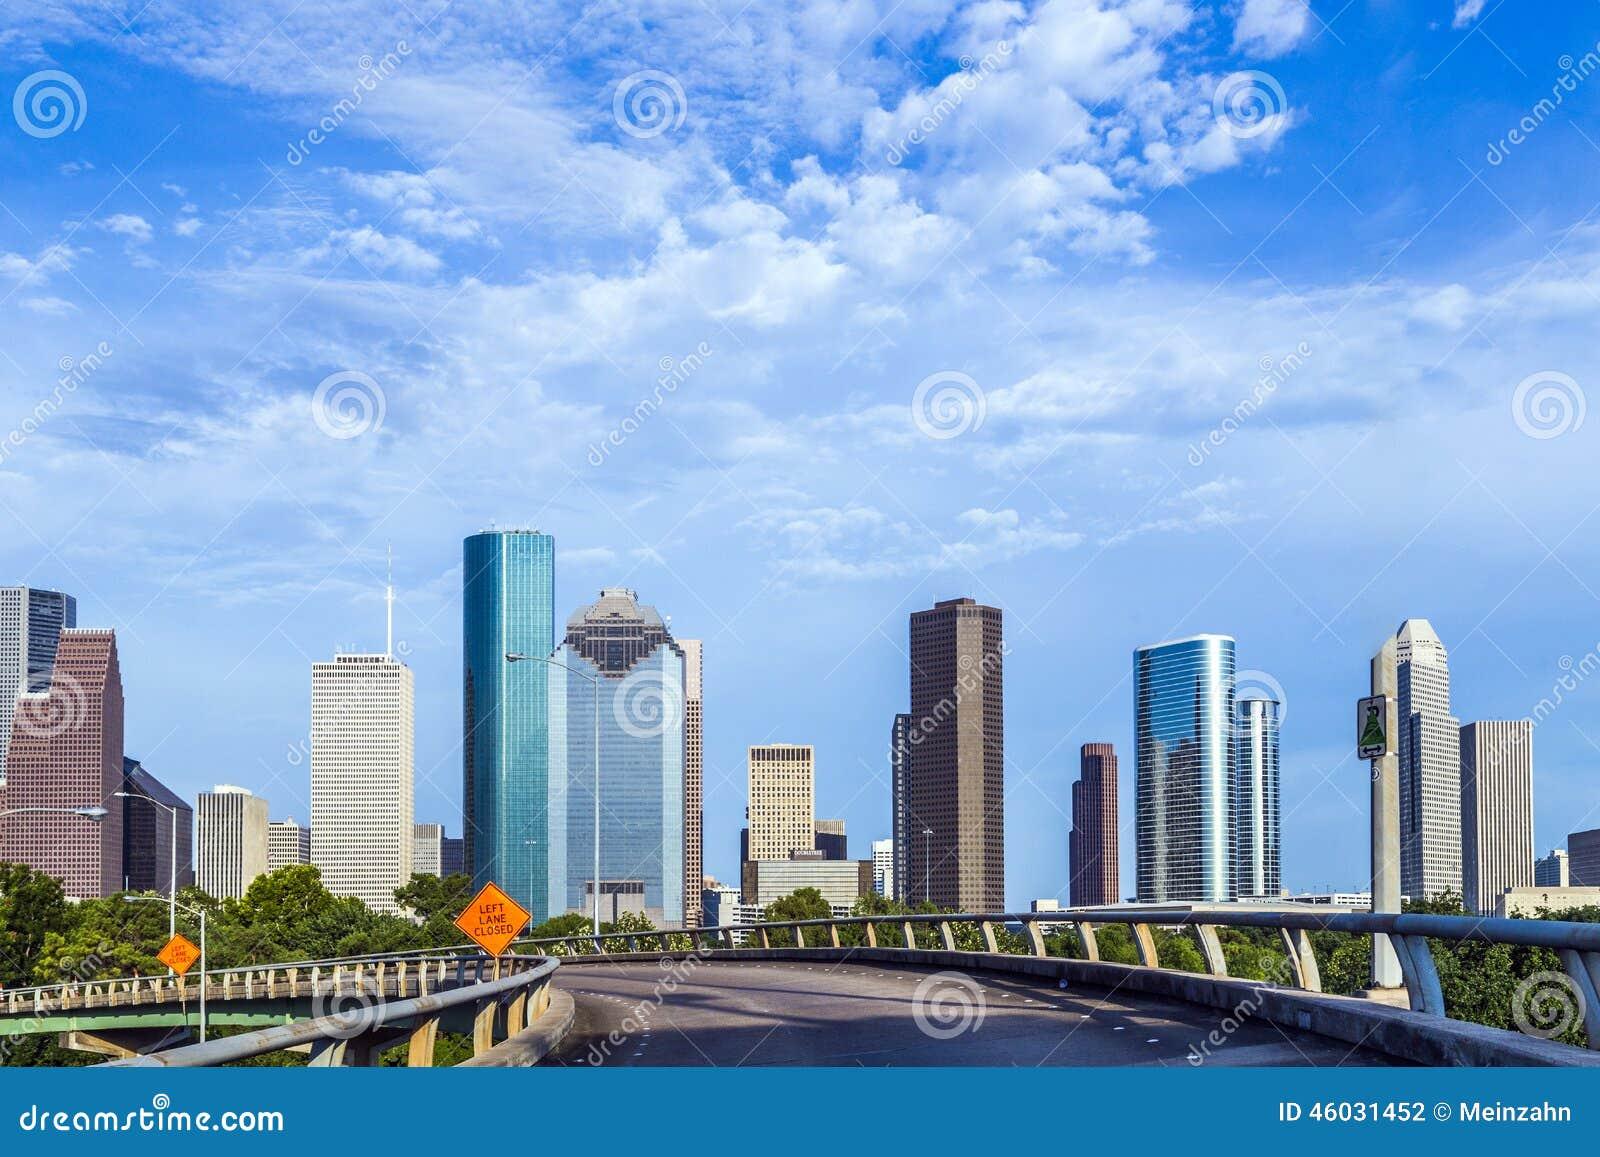 wolkenkrabber in houston texas stock foto afbeelding bestaande uit middag stad 46031452. Black Bedroom Furniture Sets. Home Design Ideas